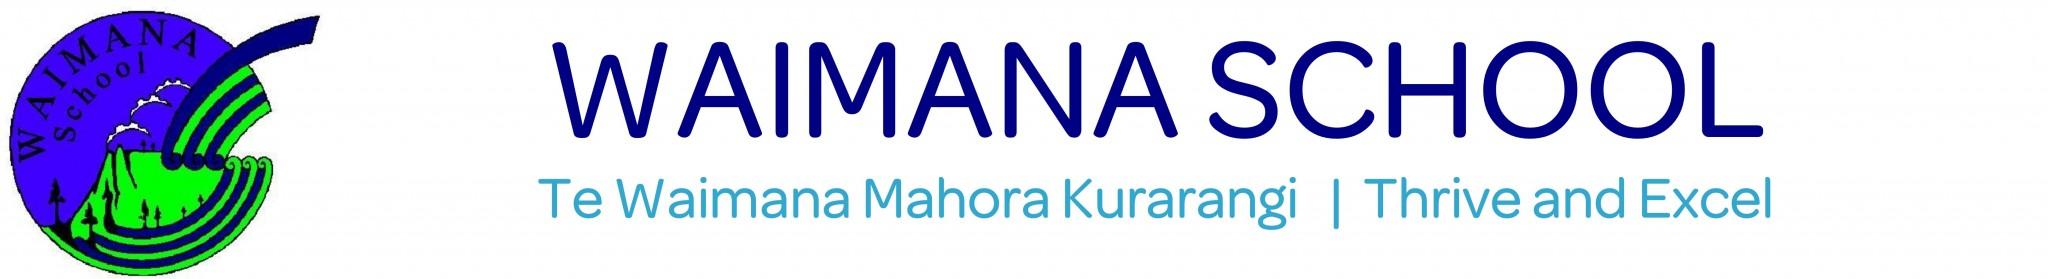 Waimana School Logo